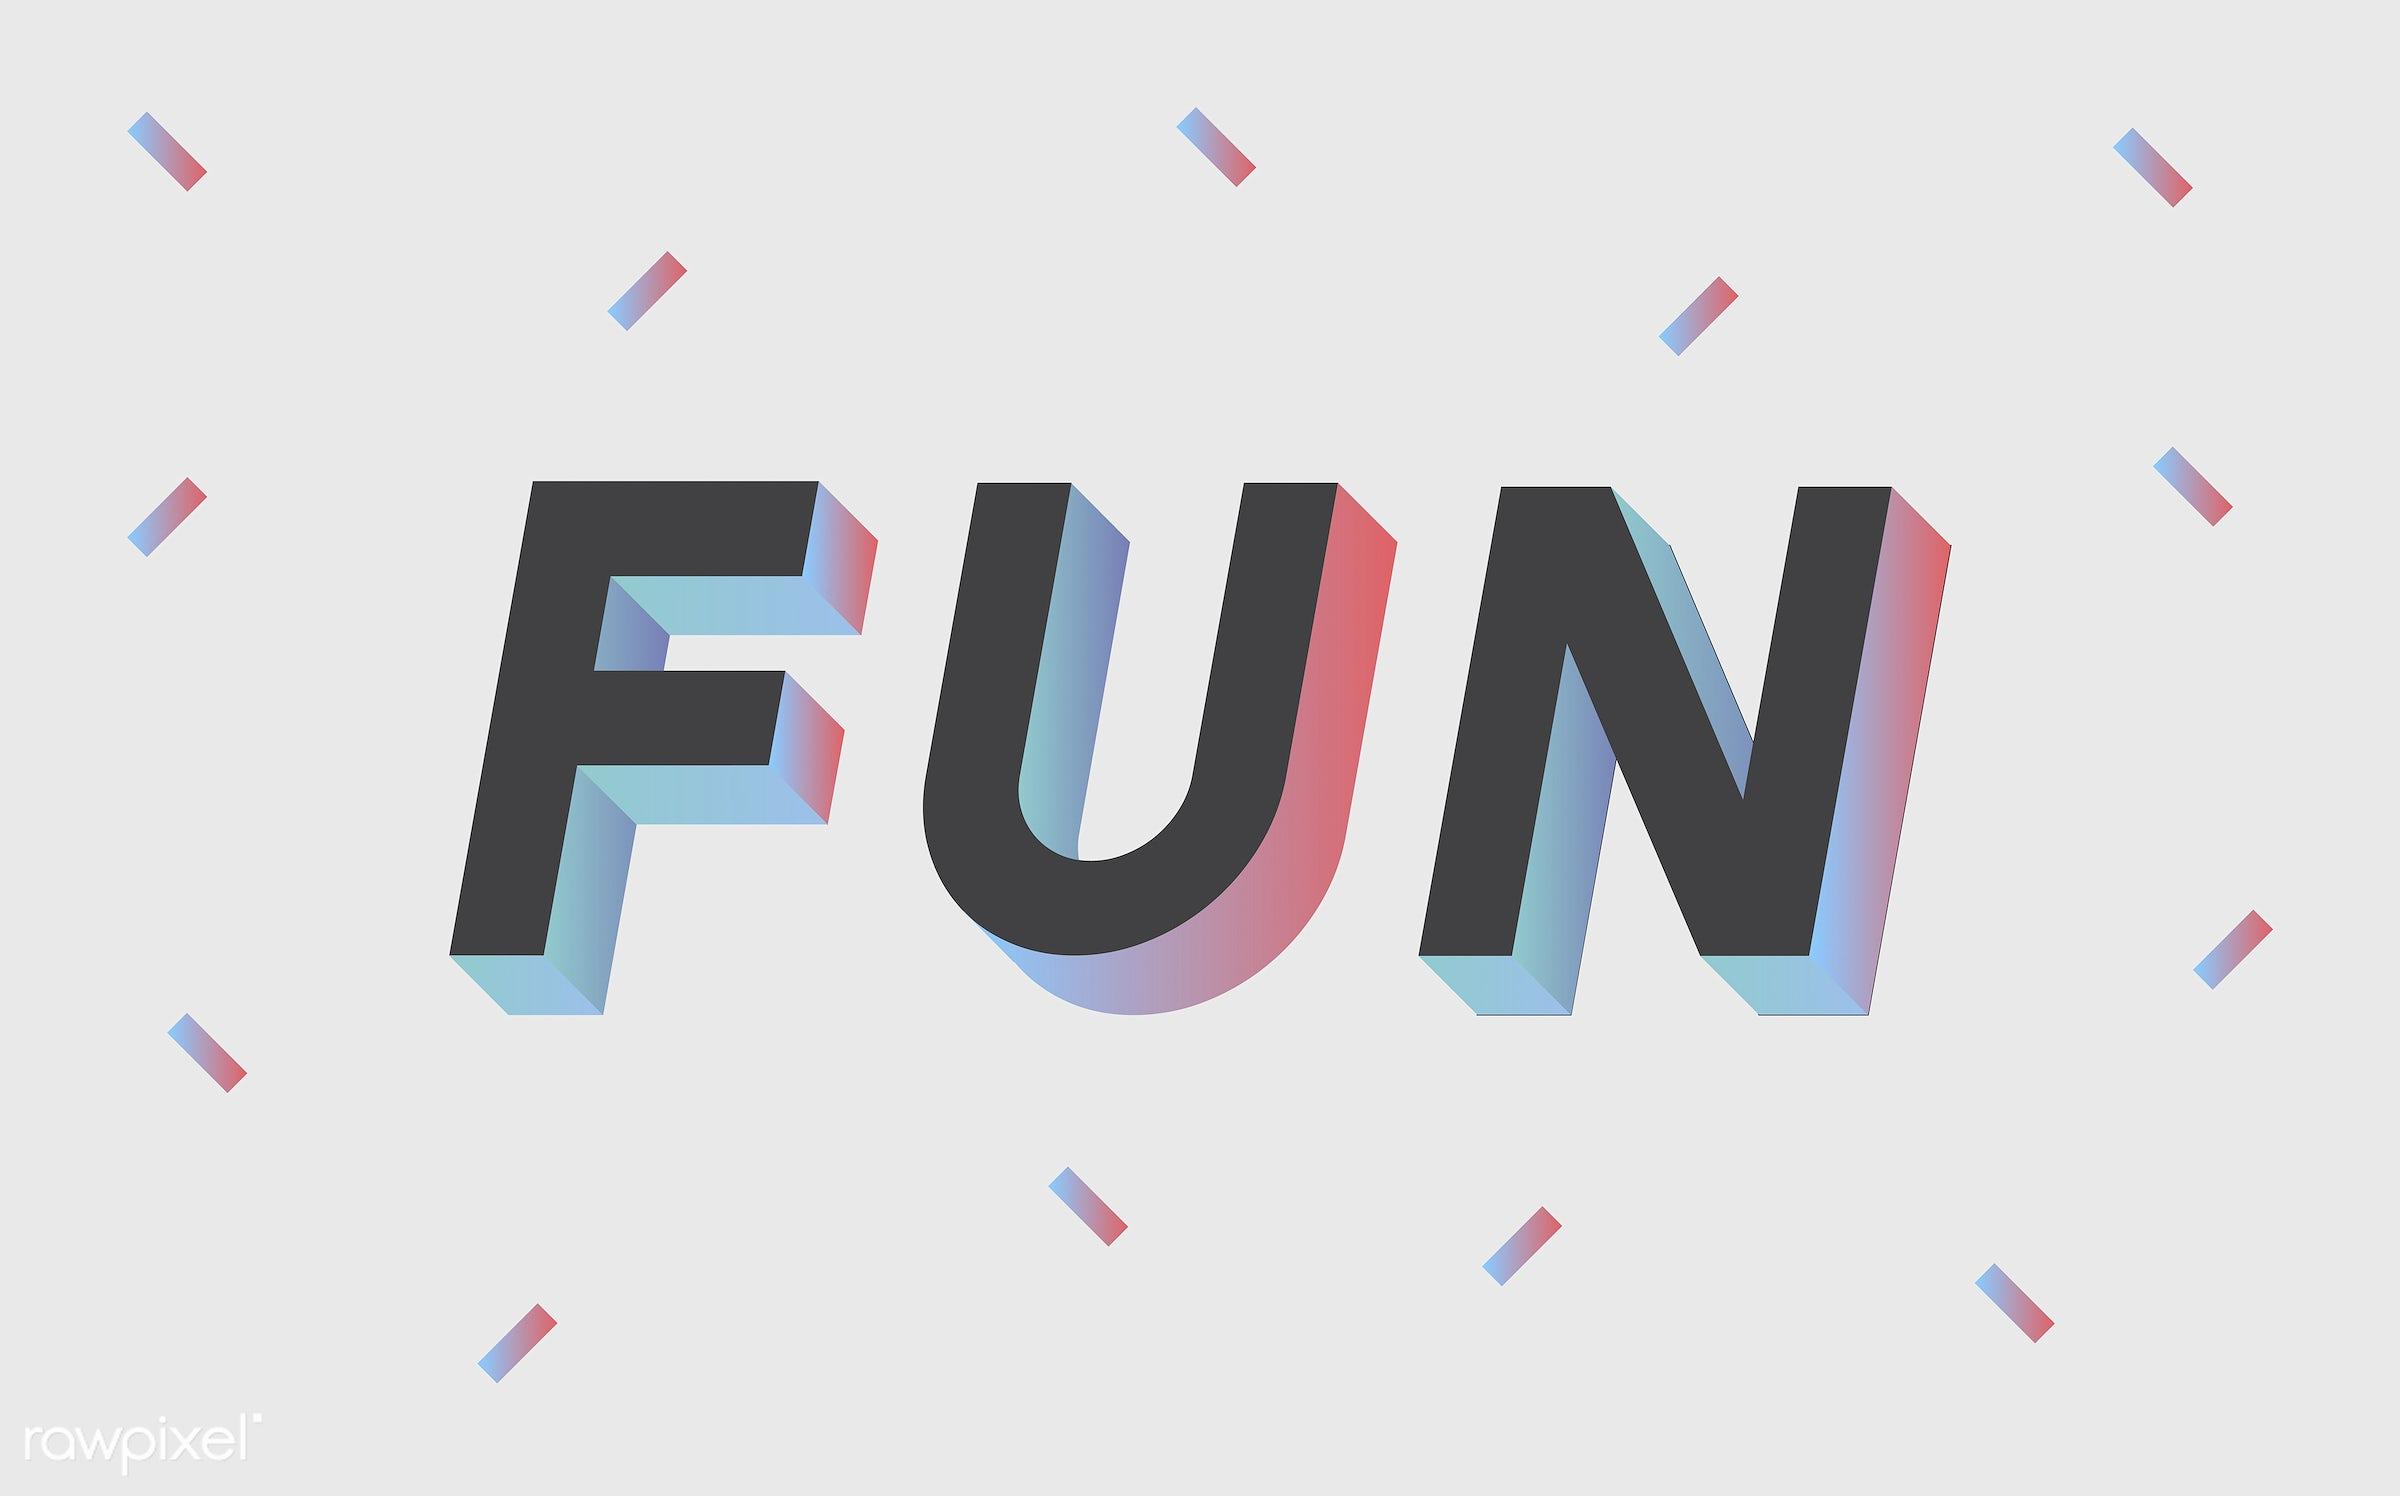 colorful, 3d, black, fun, funny, graphic, illustration, neon, three dimensional, vector, white, word